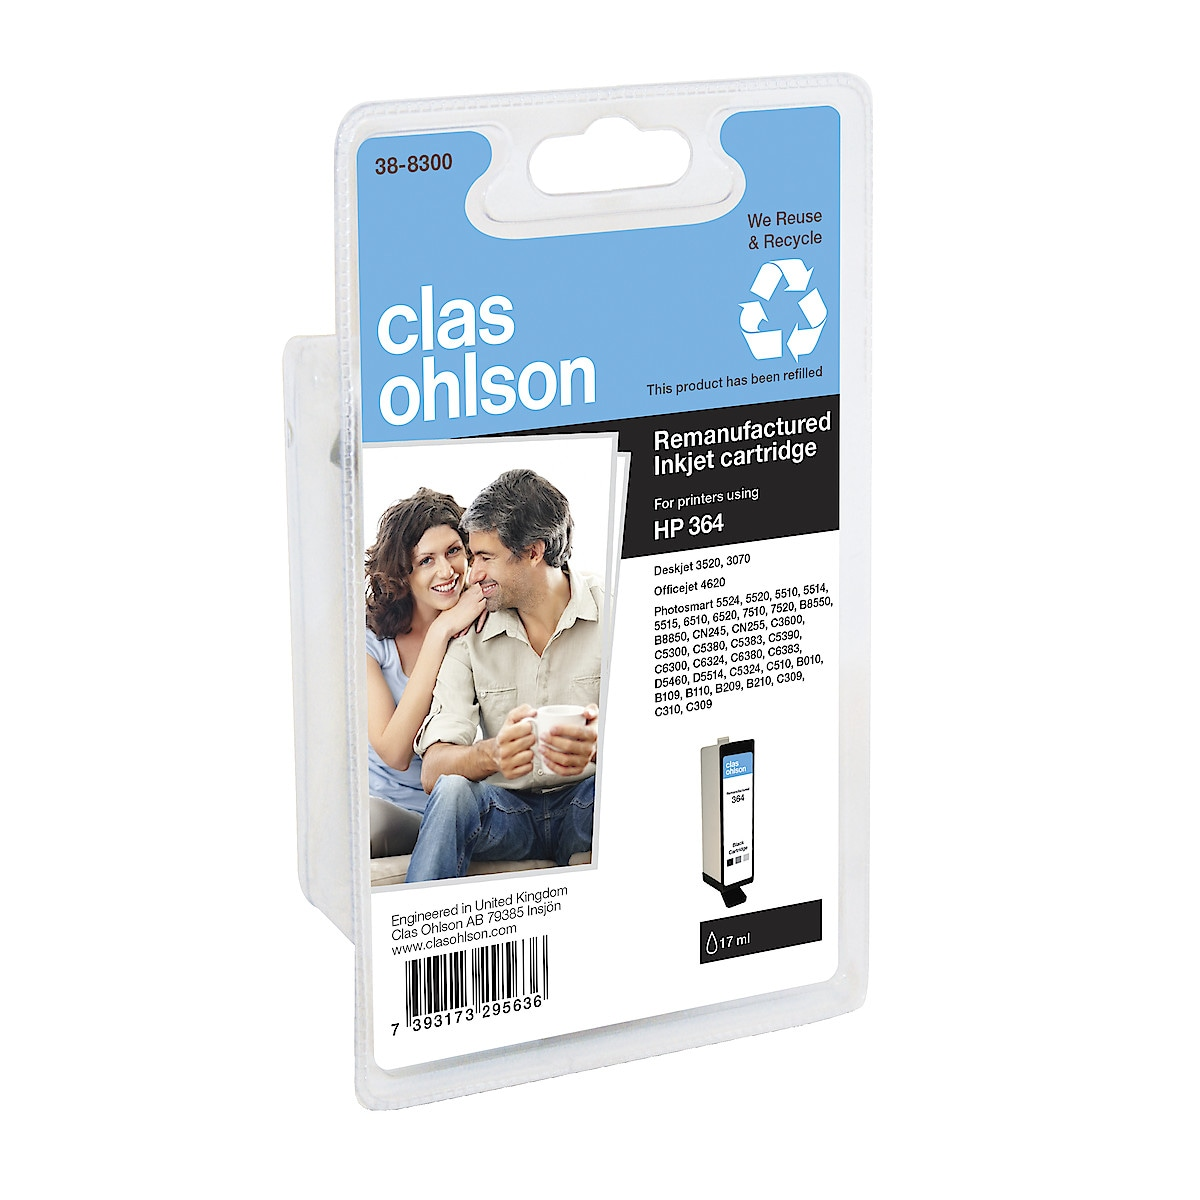 Clas Ohlson HP 364 Ink Cartridge